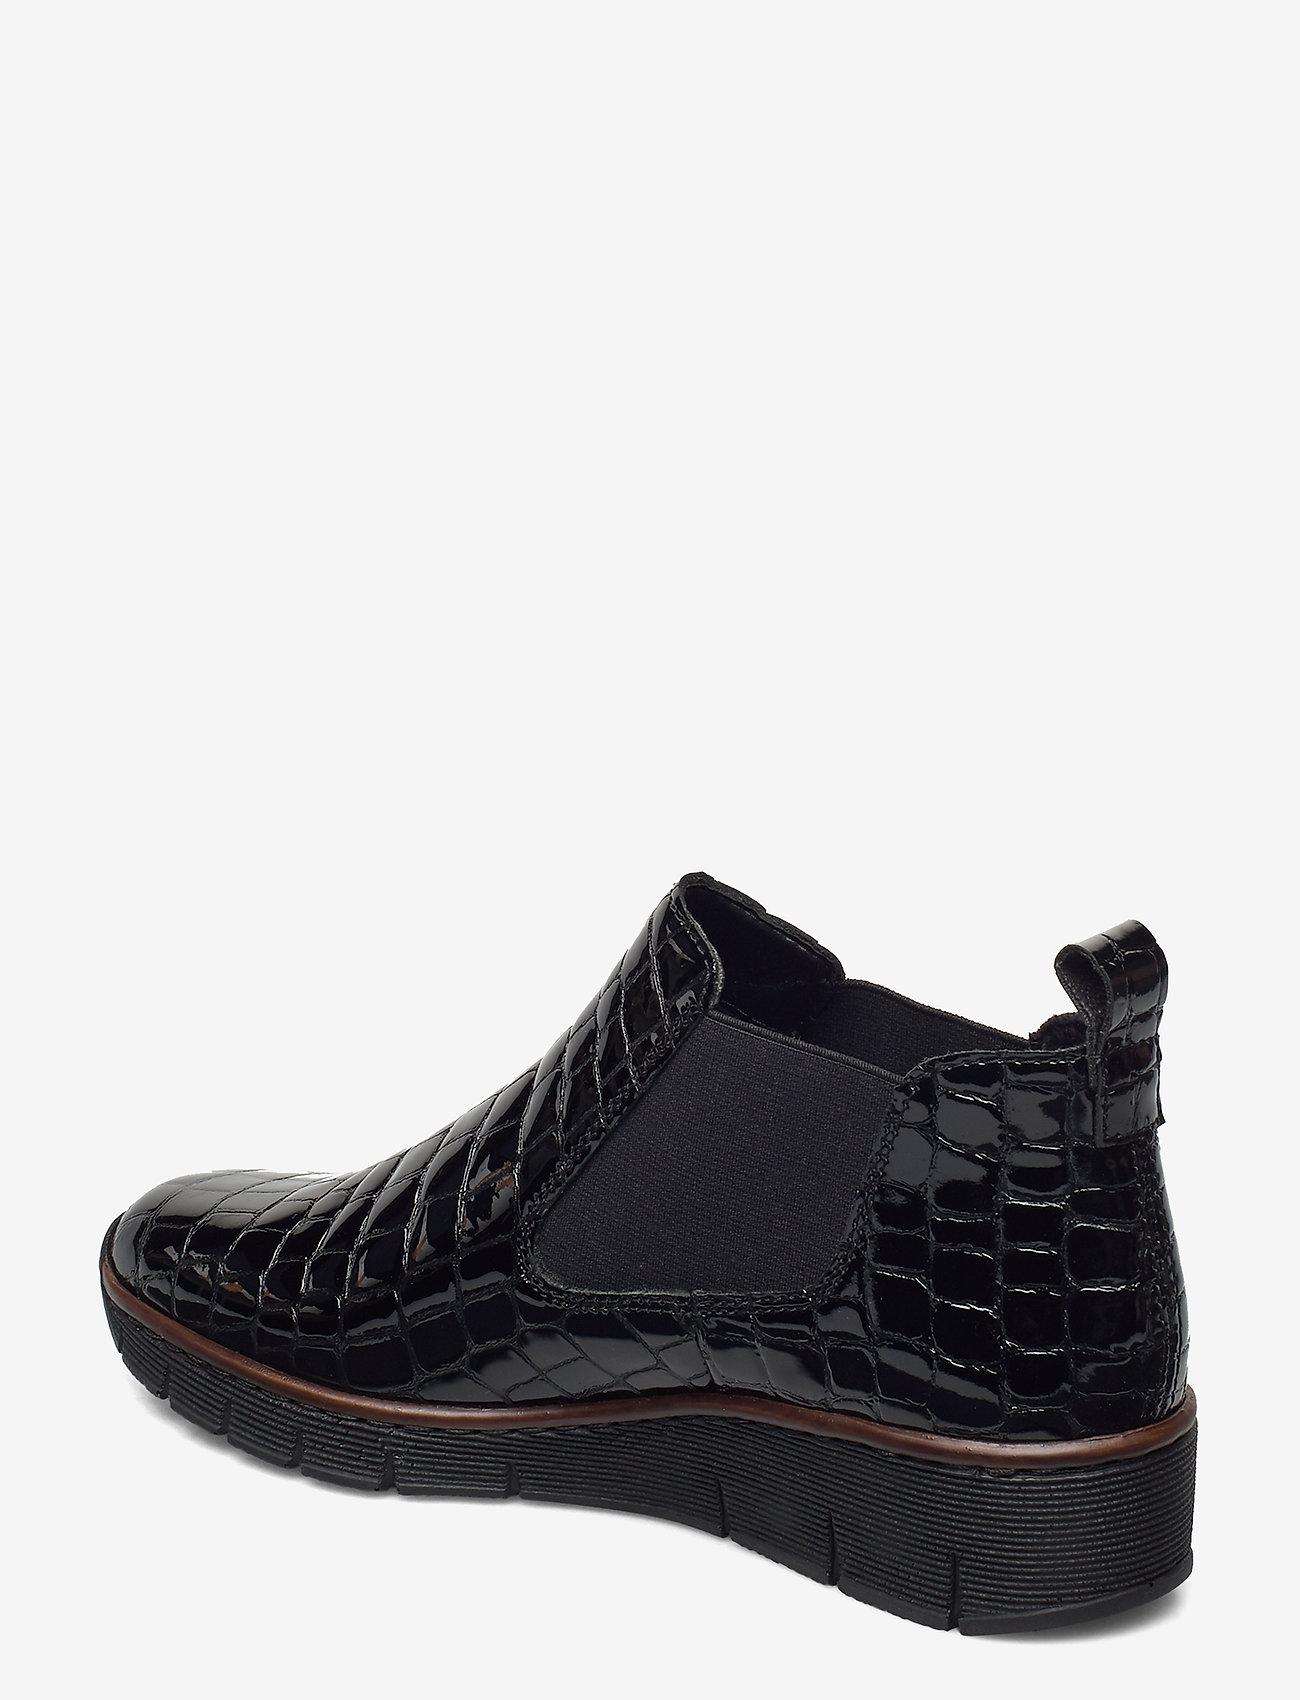 53794-01 (Black) (69.95 €) - Rieker YeeJH